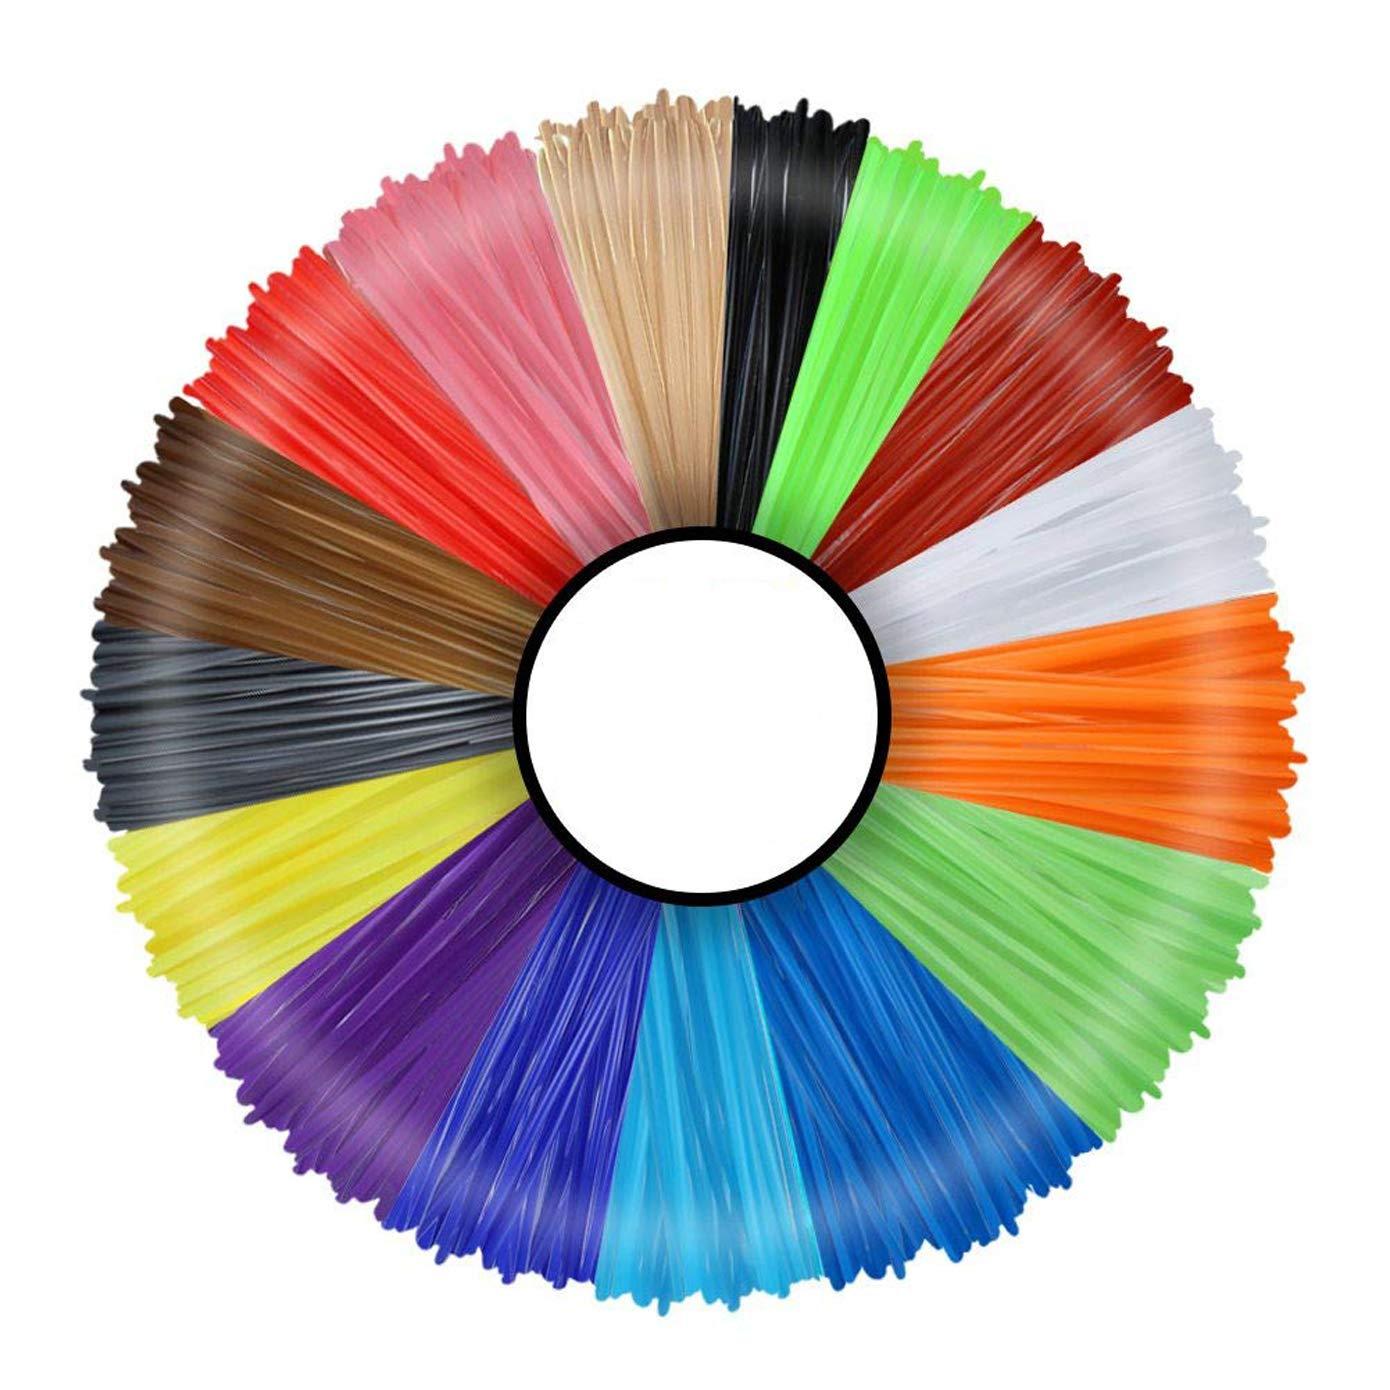 Multicolor PLA Filament Set of 16